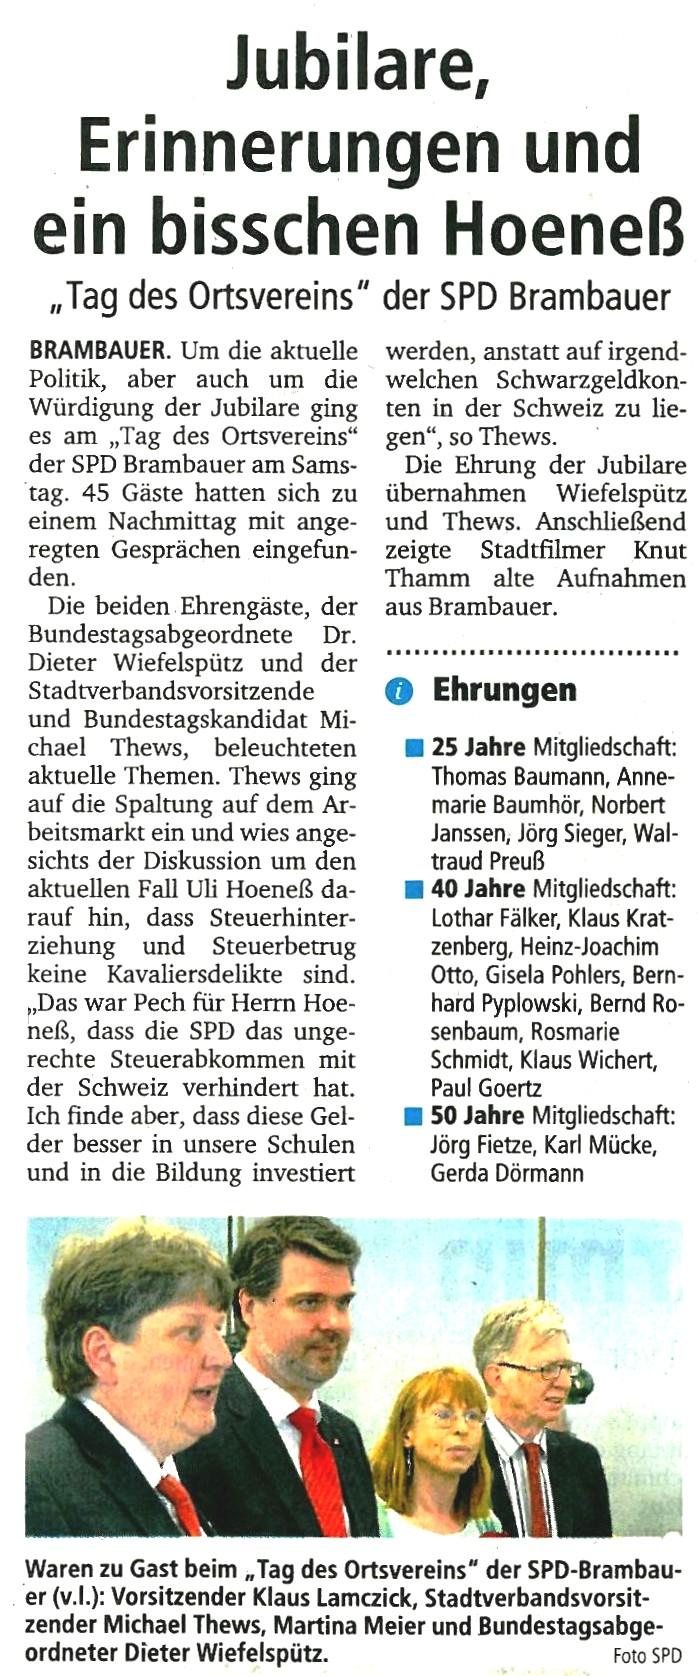 Ruhrnachrichten am 28.05.2013